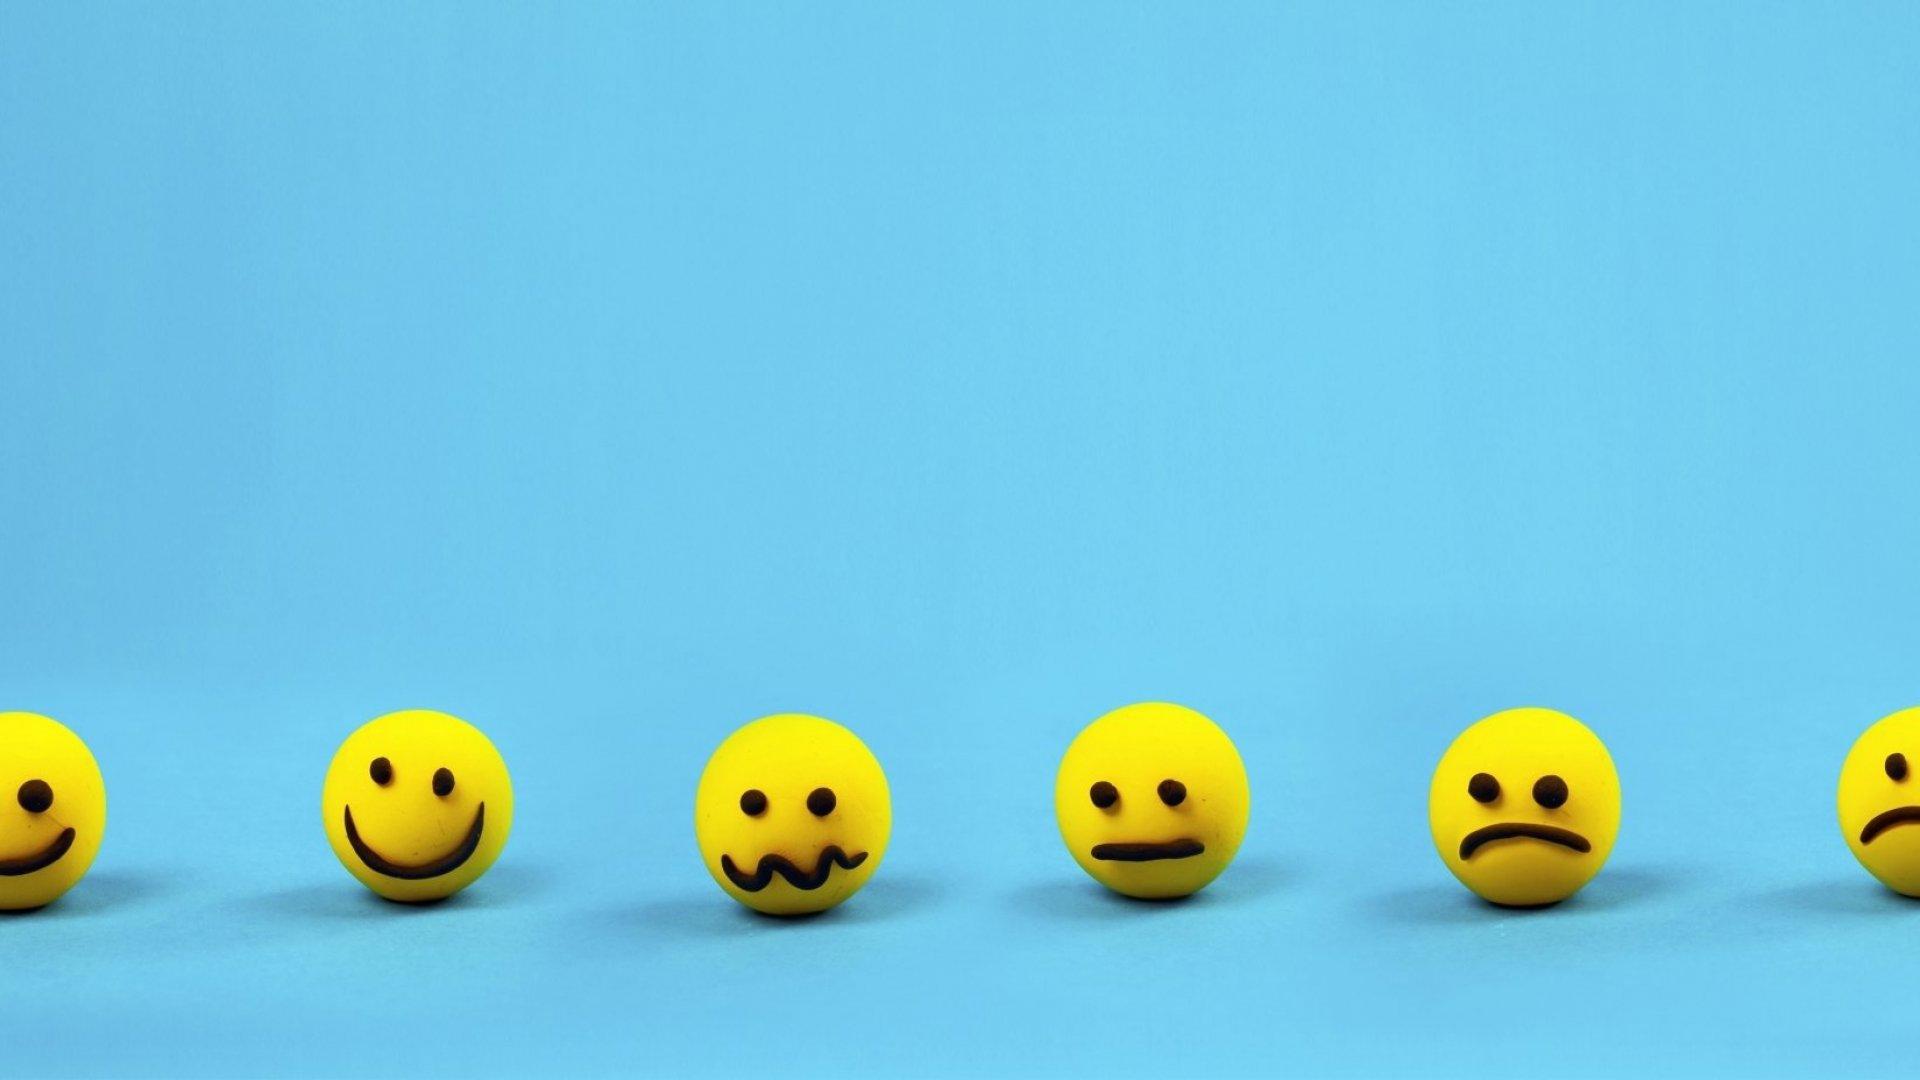 Surprise: A New Analysis of 777 Million Facebook Posts Reveals Positivity Outperforms Negativity